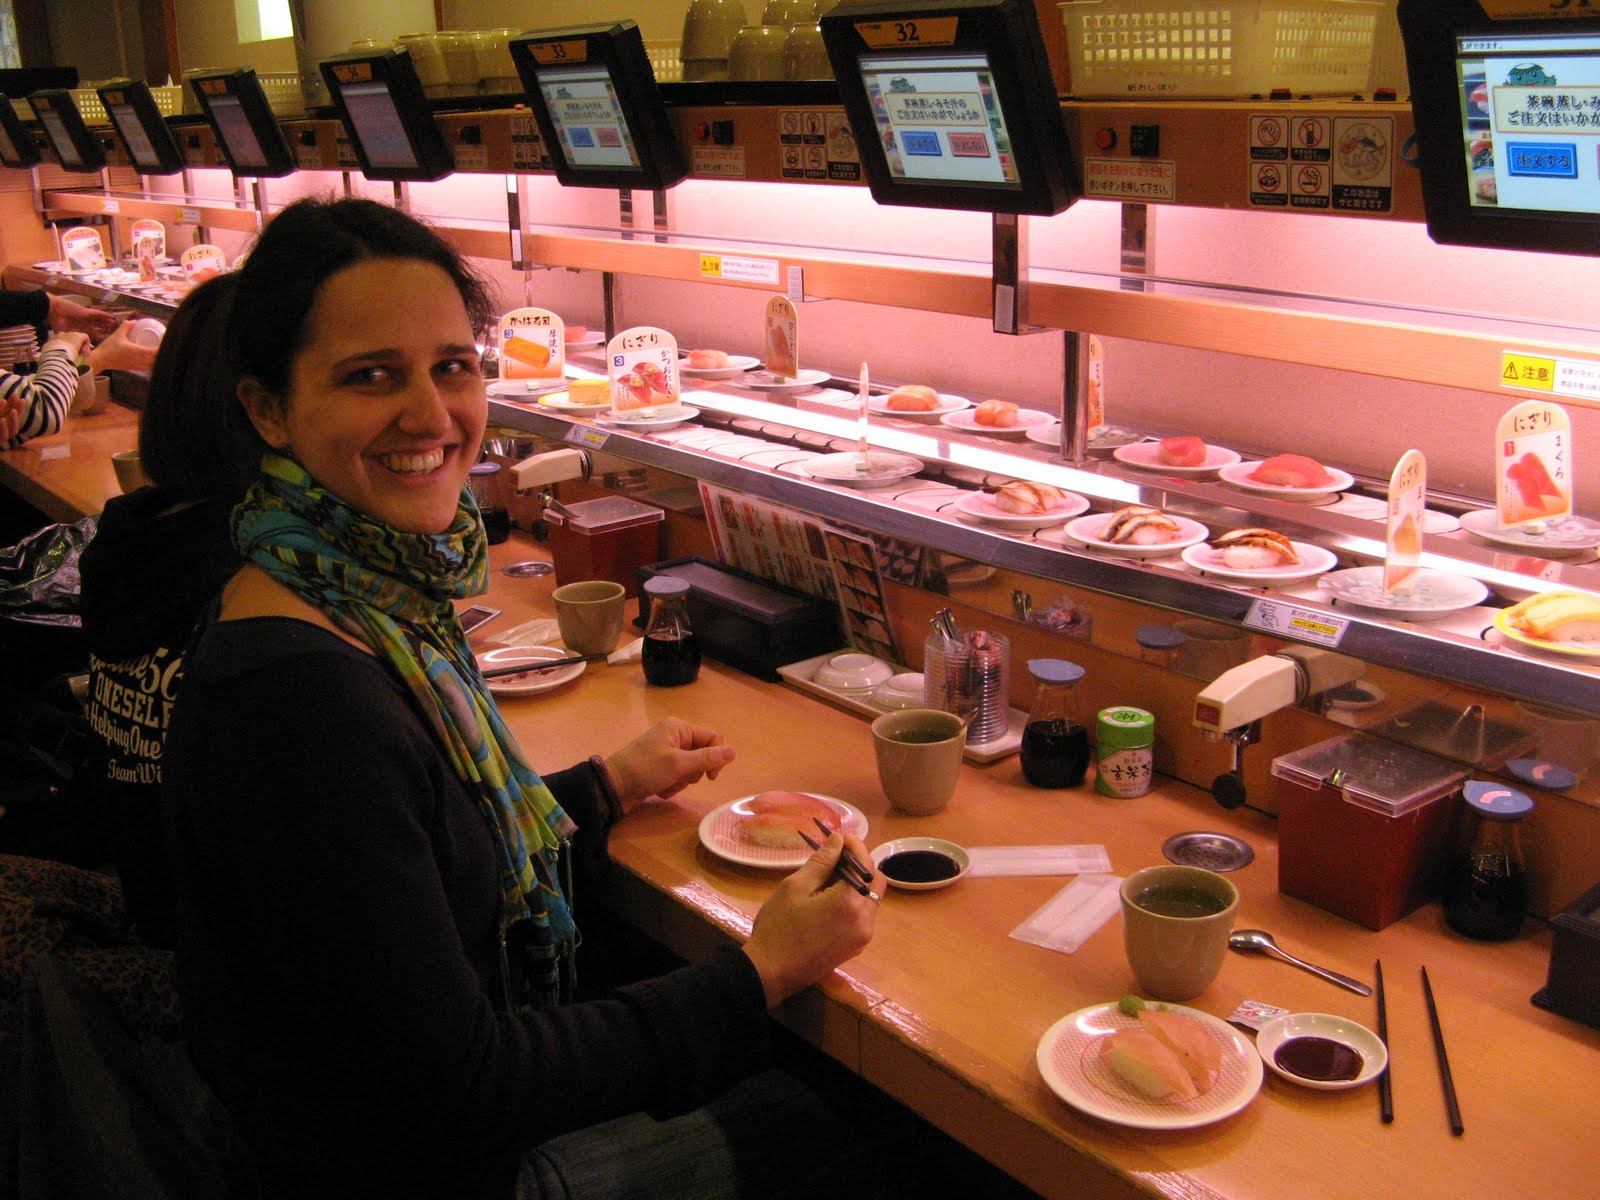 Restaurant Japonais Lyon  Ef Bf Bd Volont Ef Bf Bd